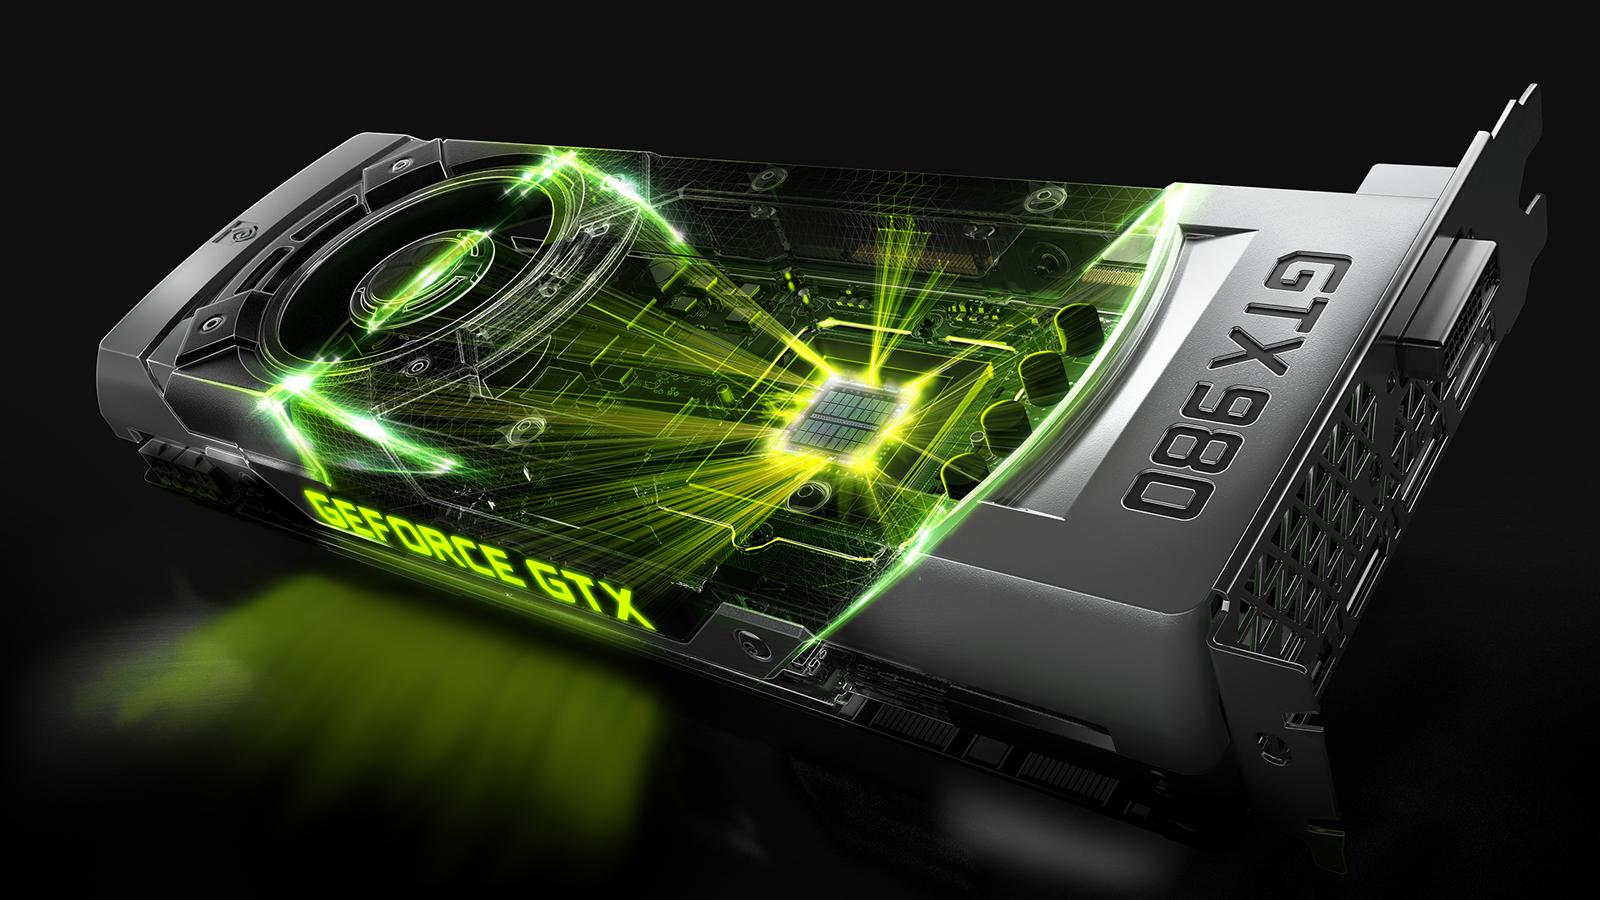 Nvidia geforce 6150se - f50c